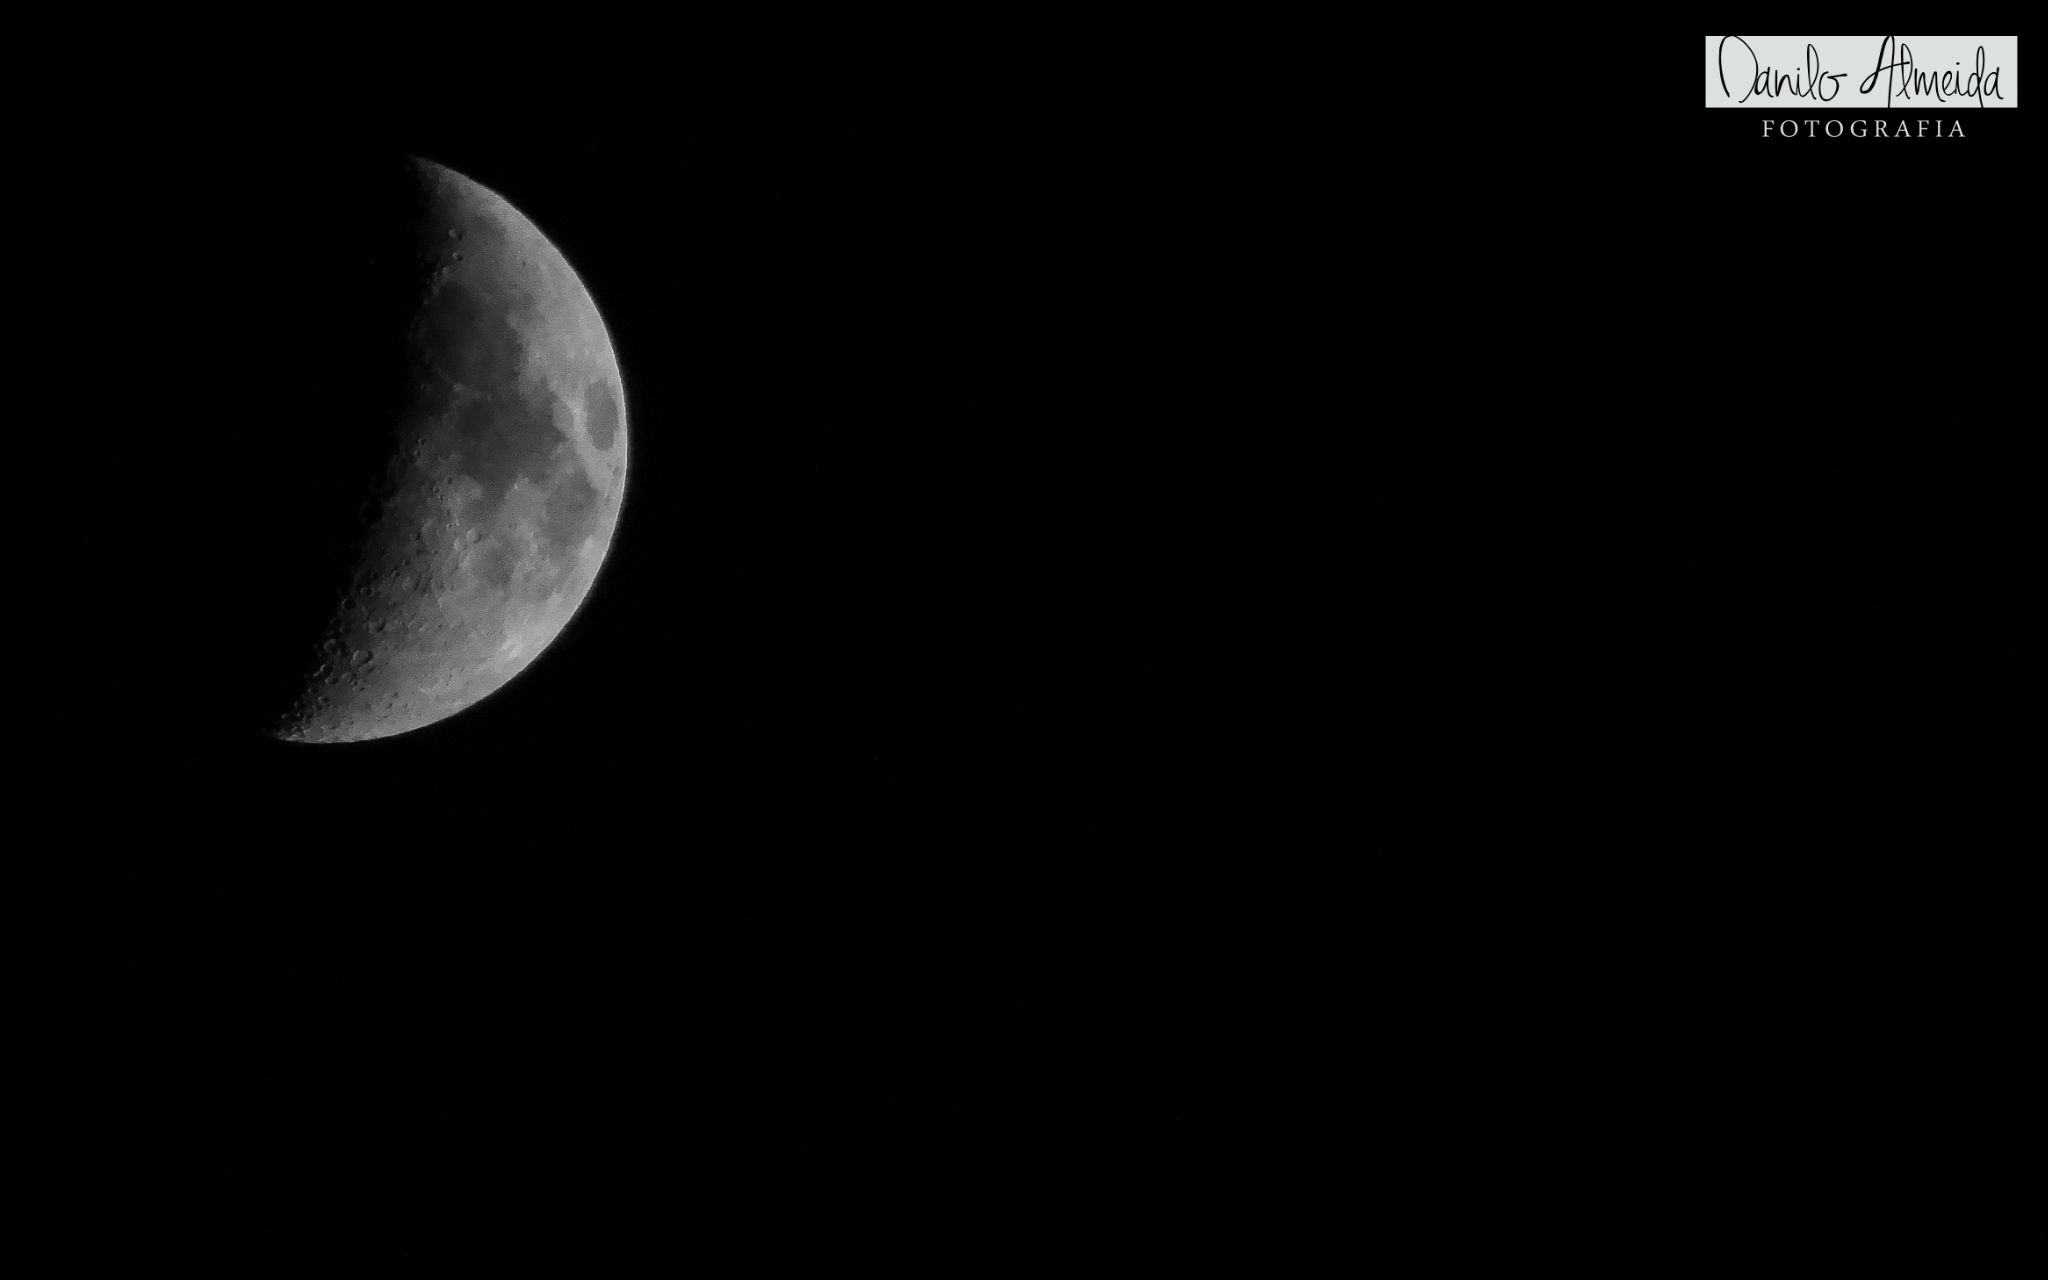 The moon by Danilo Almeida